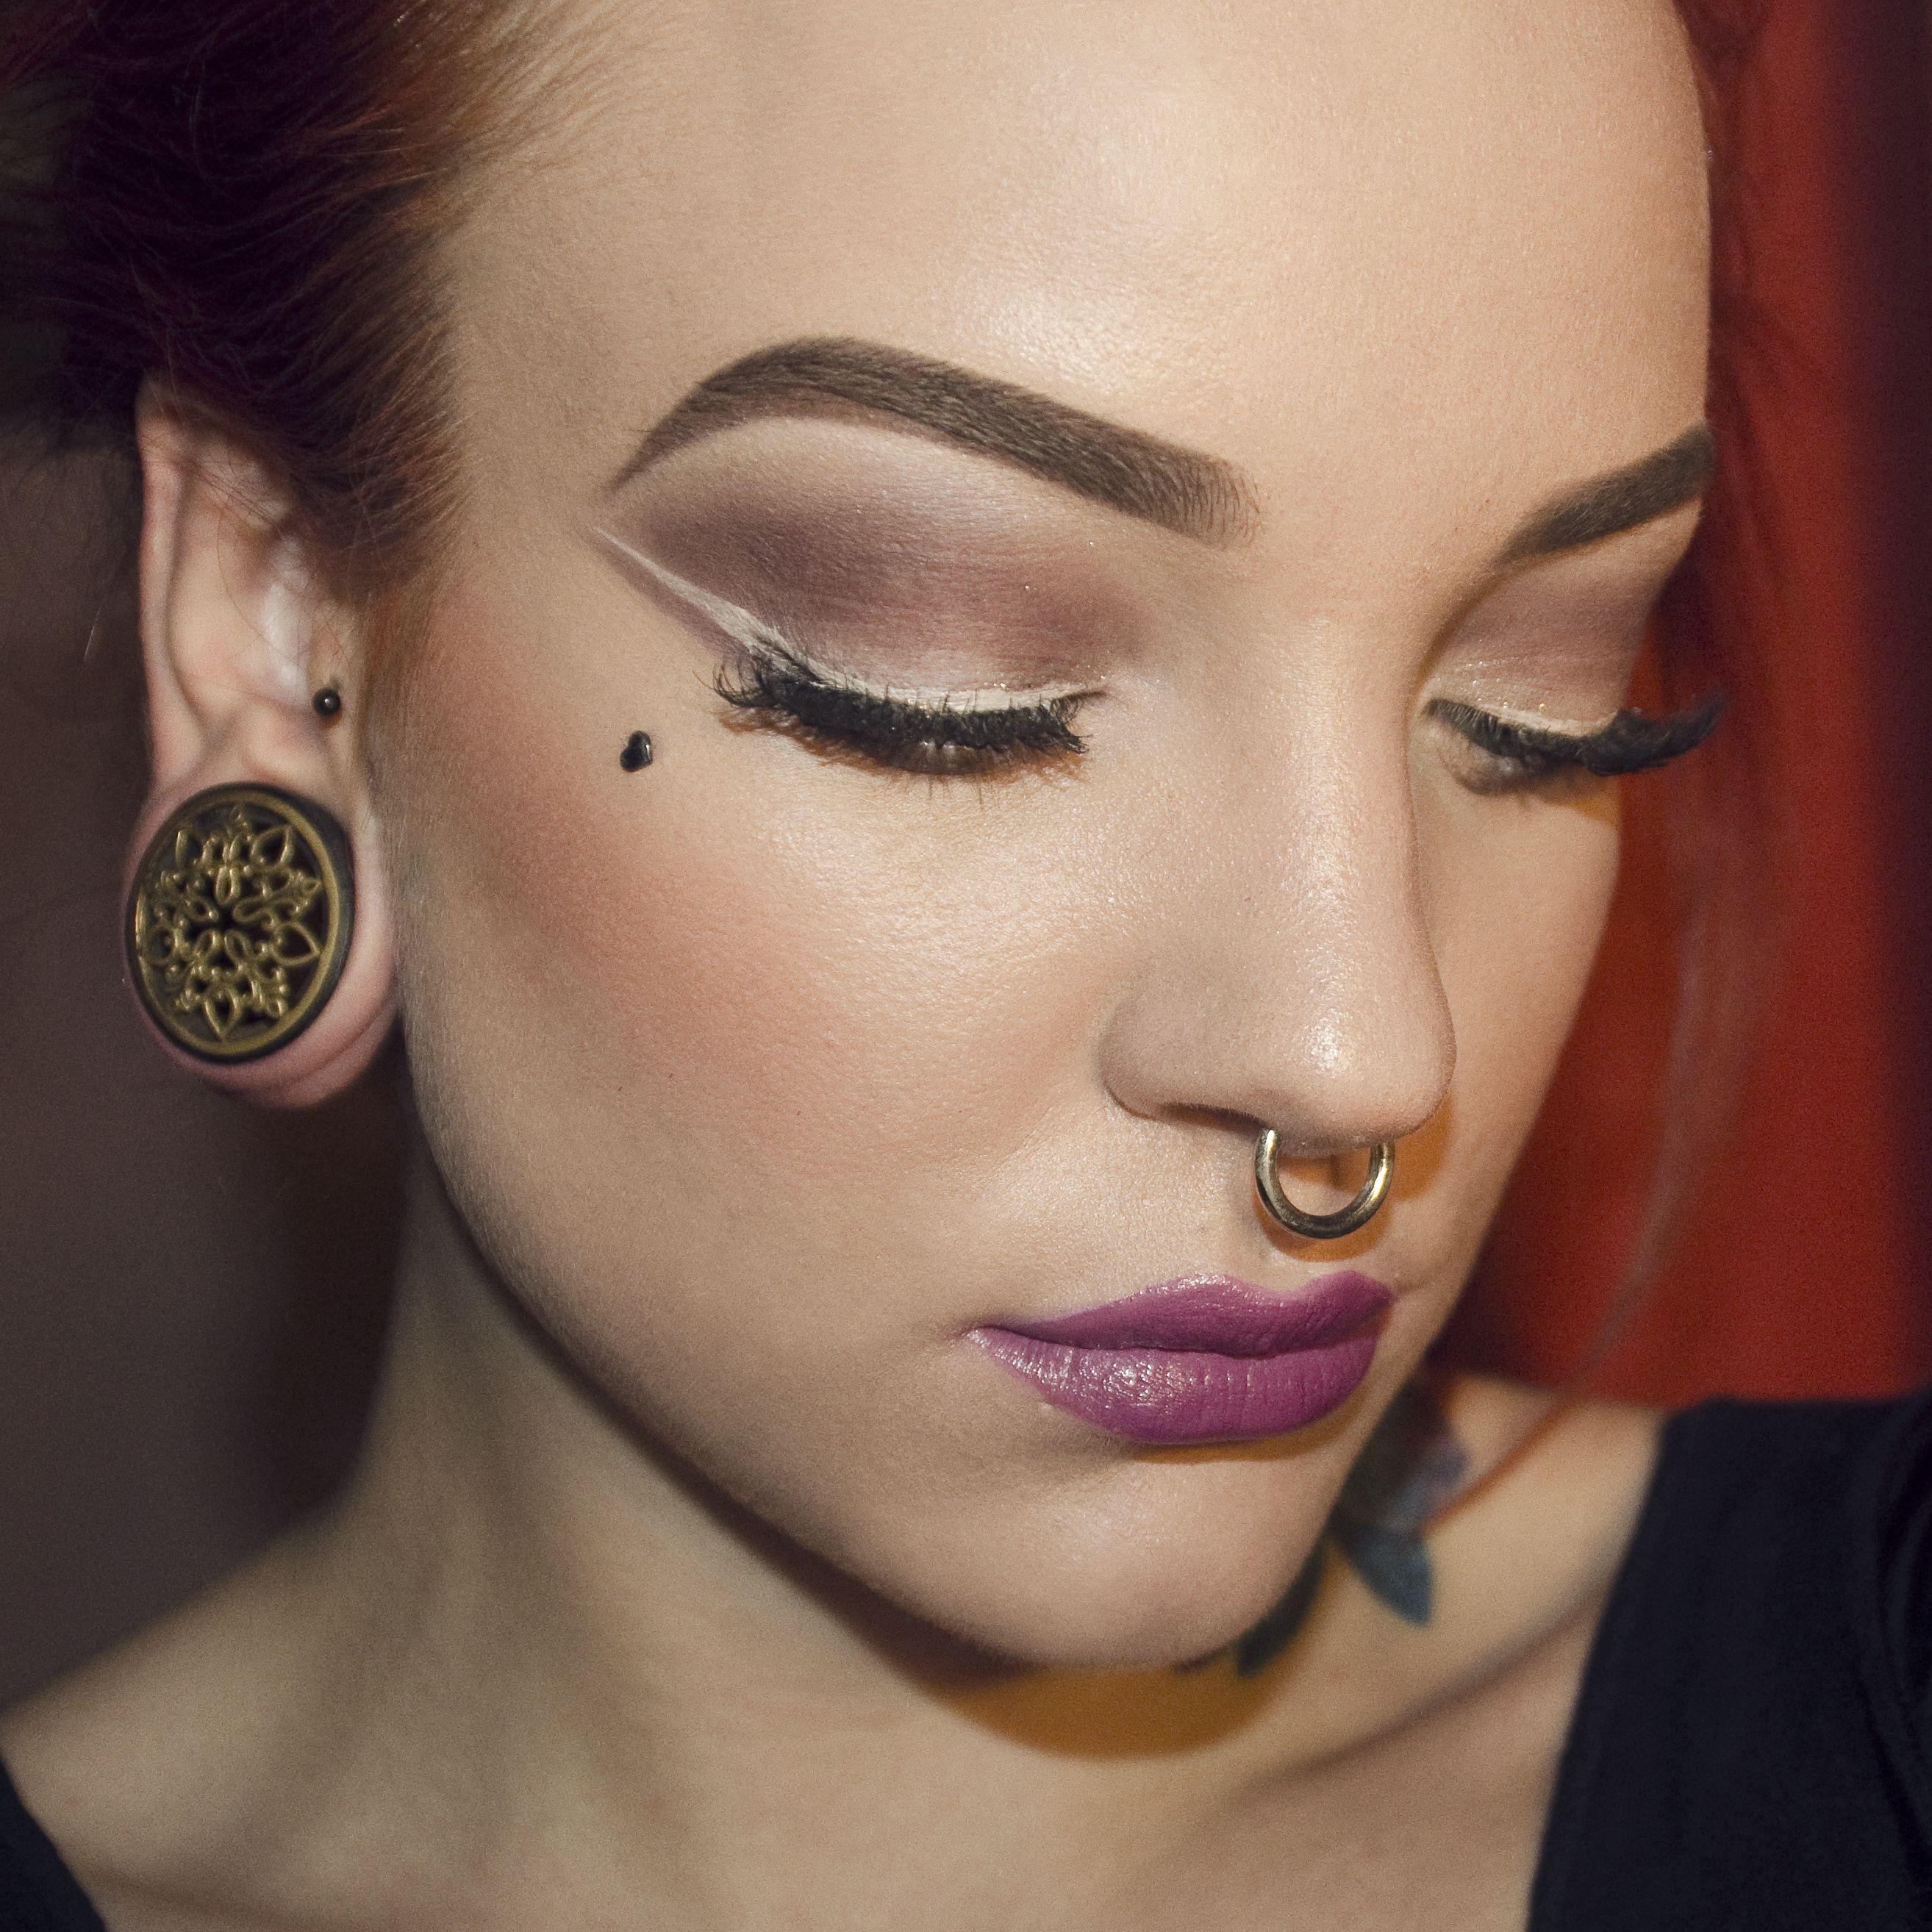 Makeup white eyeline and violet ipstick by Koki9